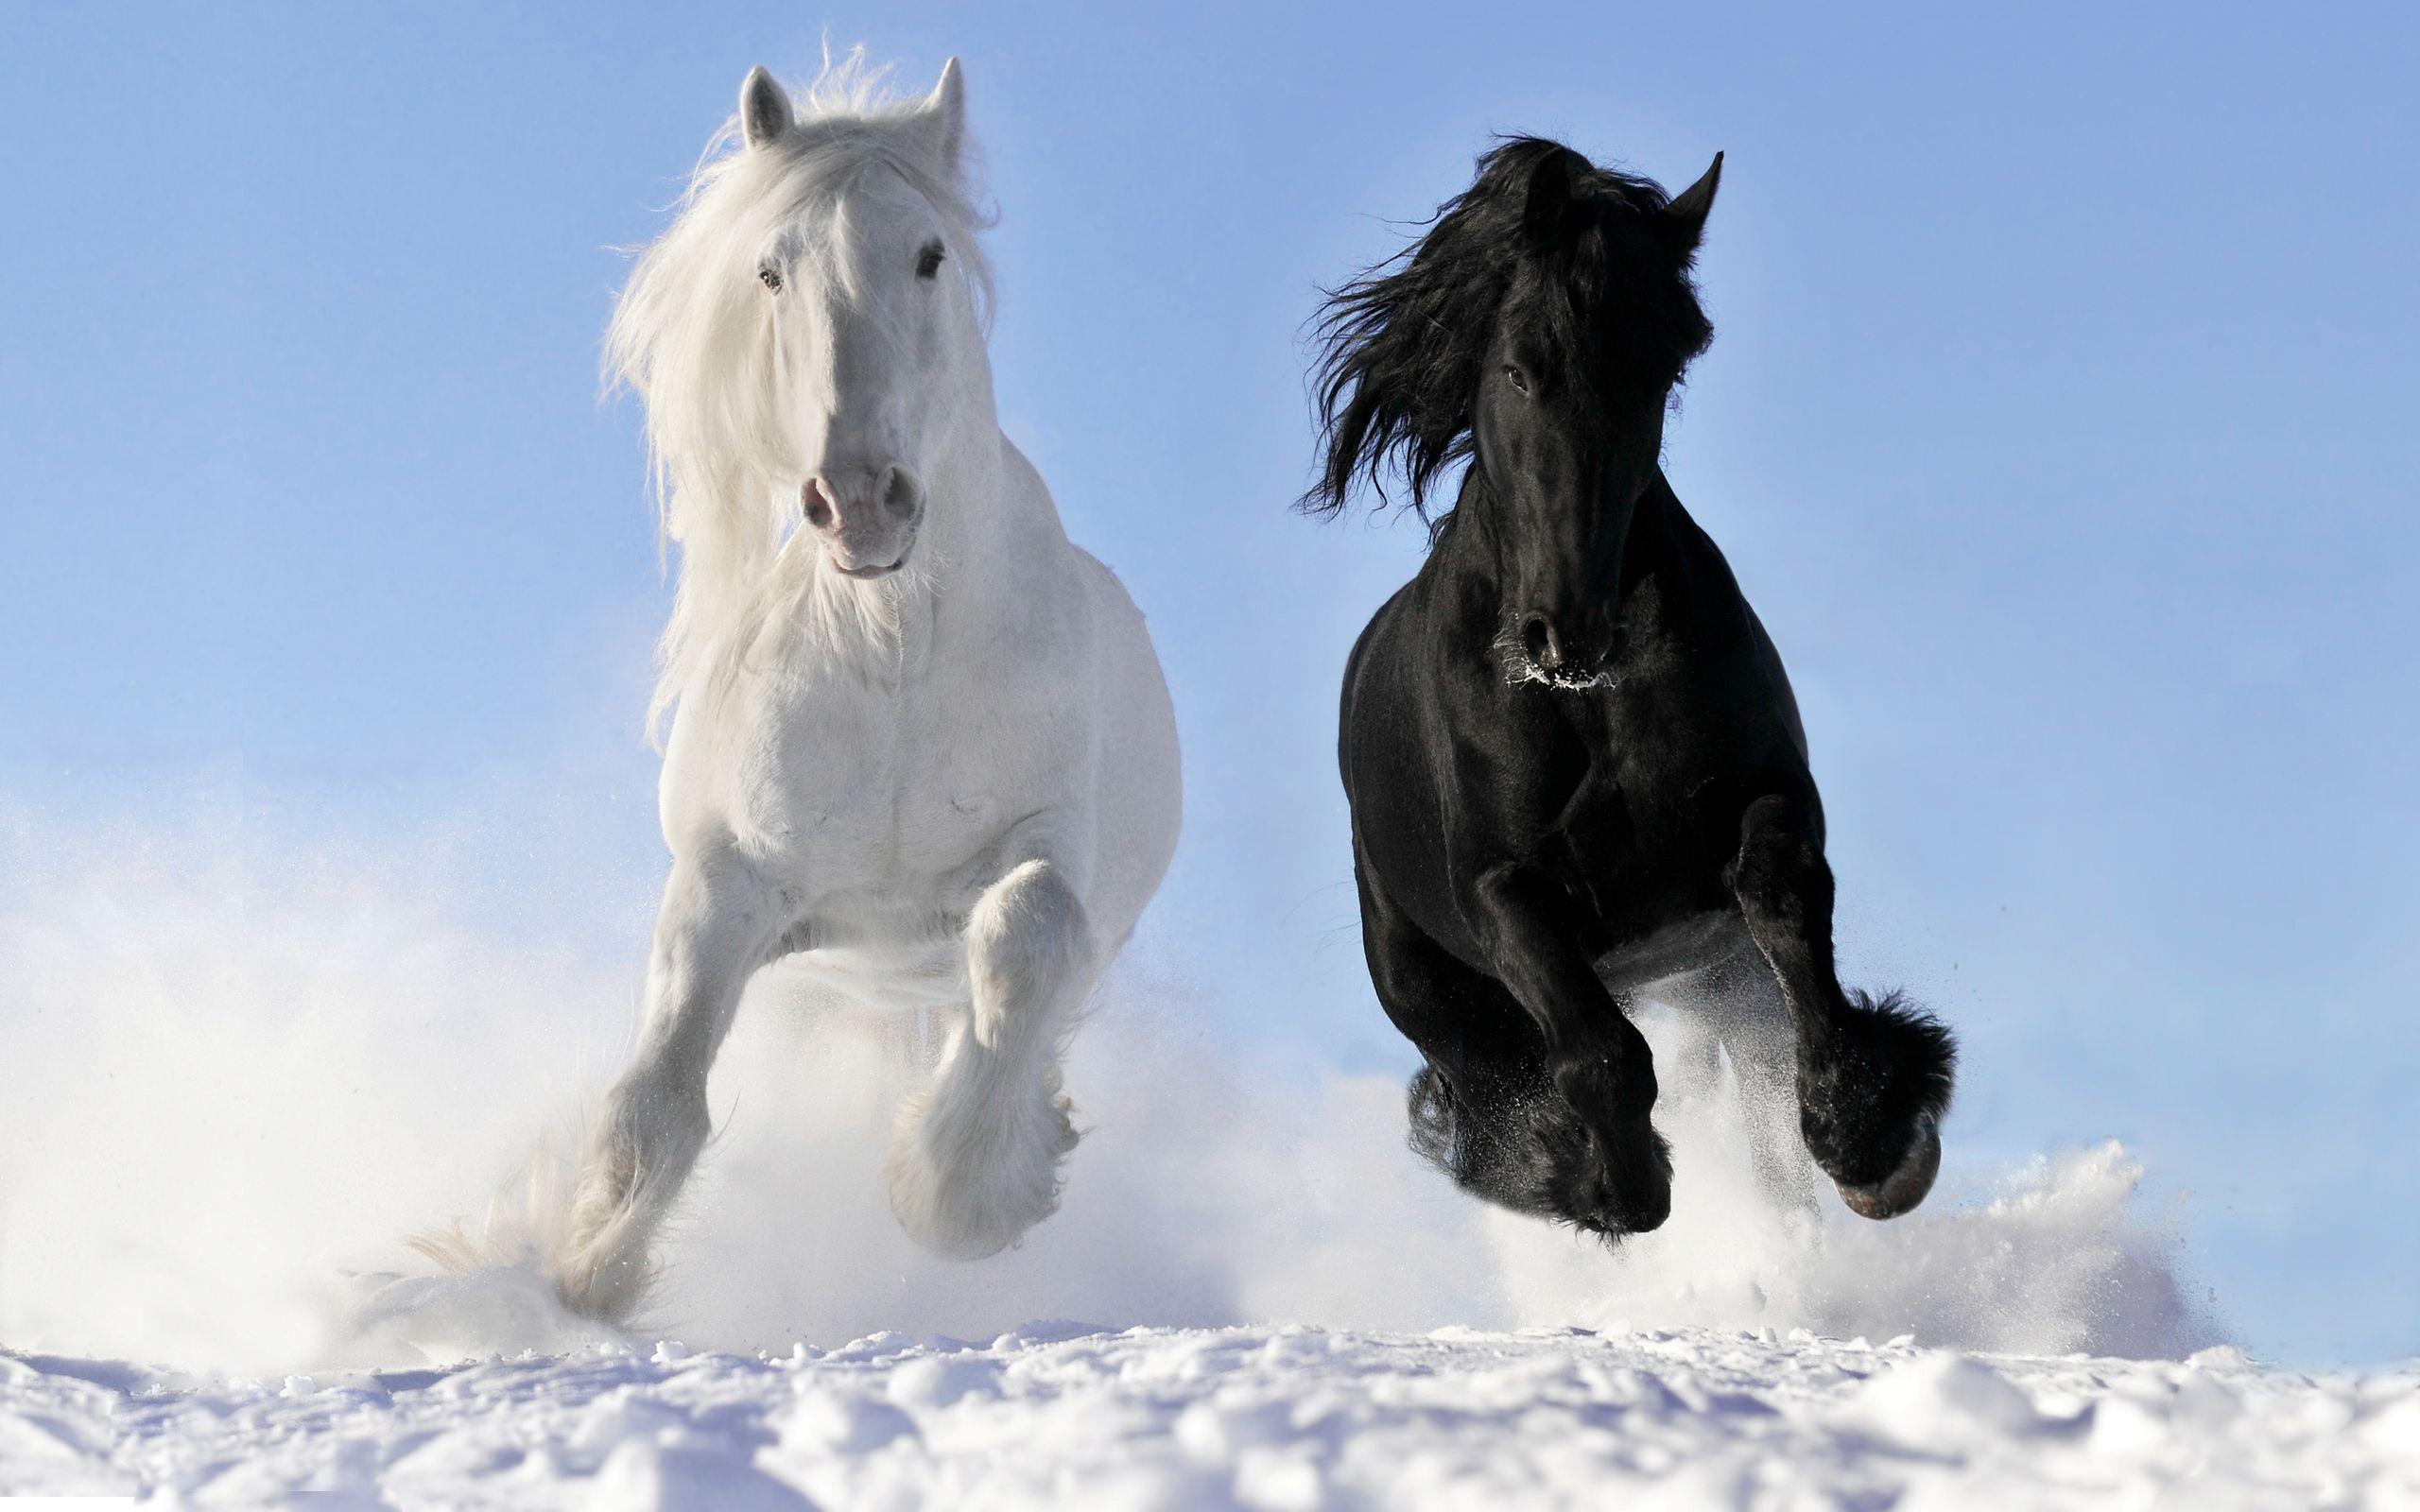 Best Wallpaper Horse Snow - 5d5f7b98d0f8762a97445ffbf45a5ada  Pictures_569062.jpg